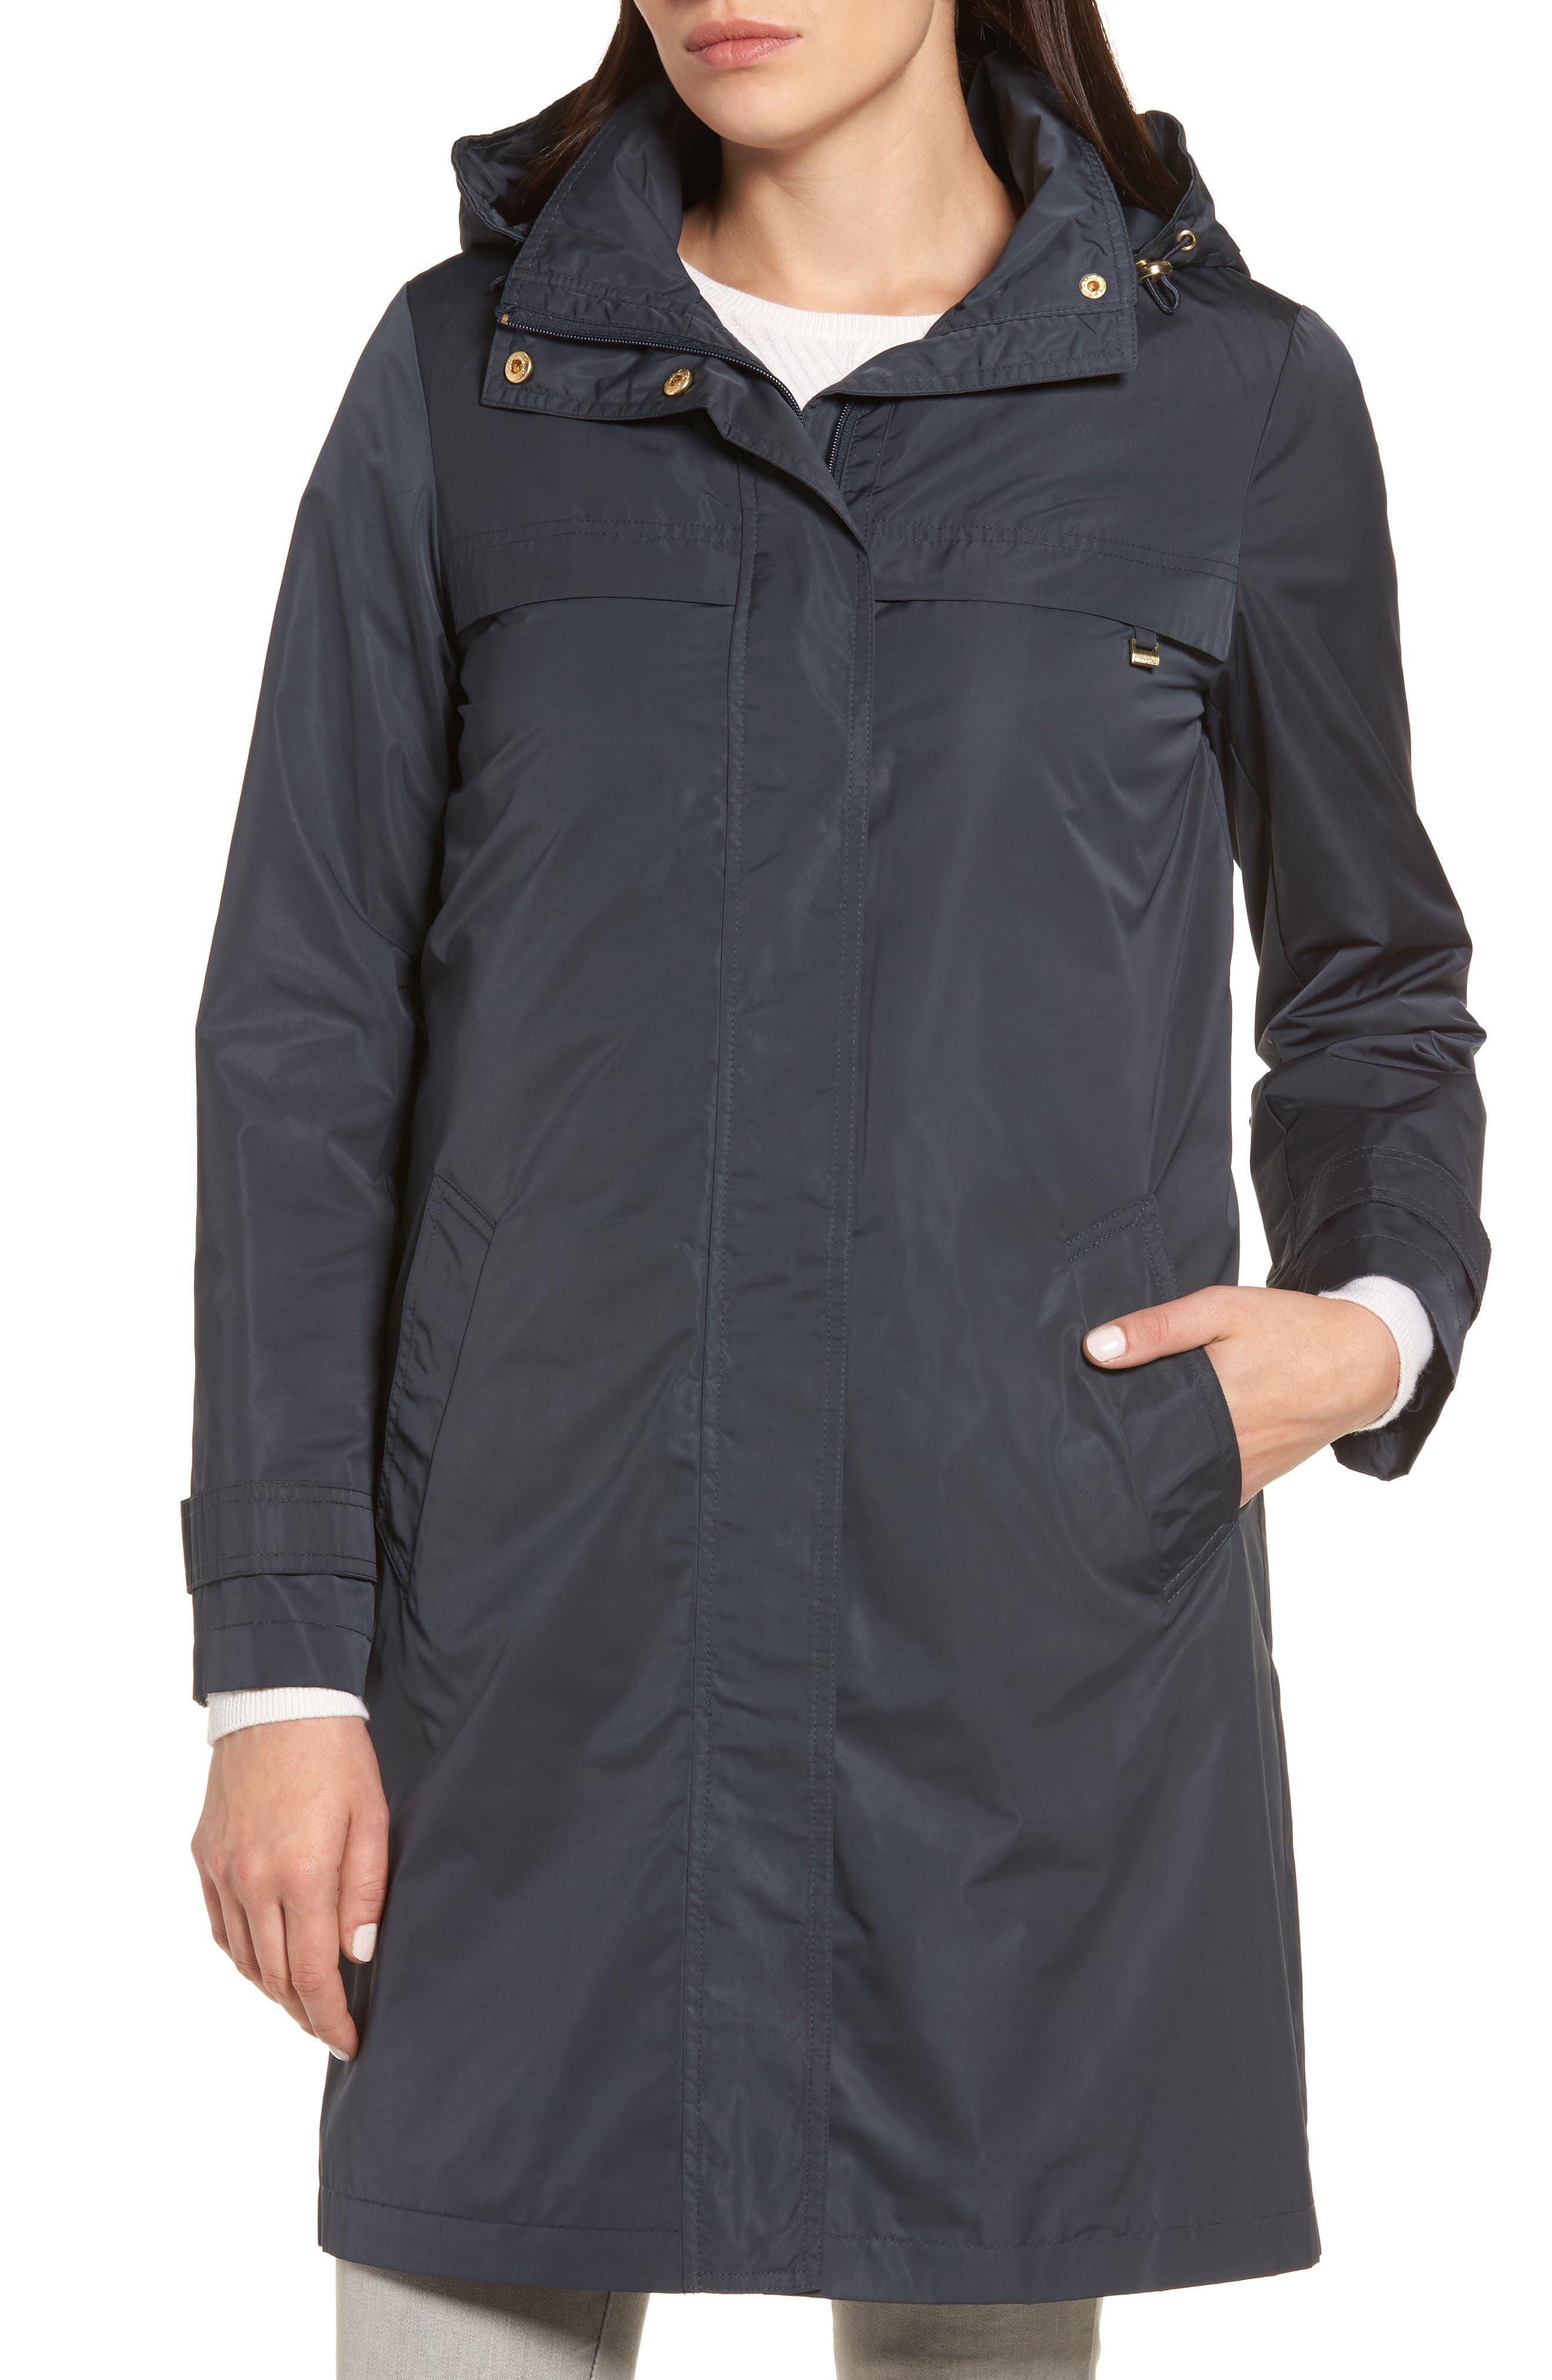 Raincoat with Detachable Hood,                             Main thumbnail 1, color,                             Navy